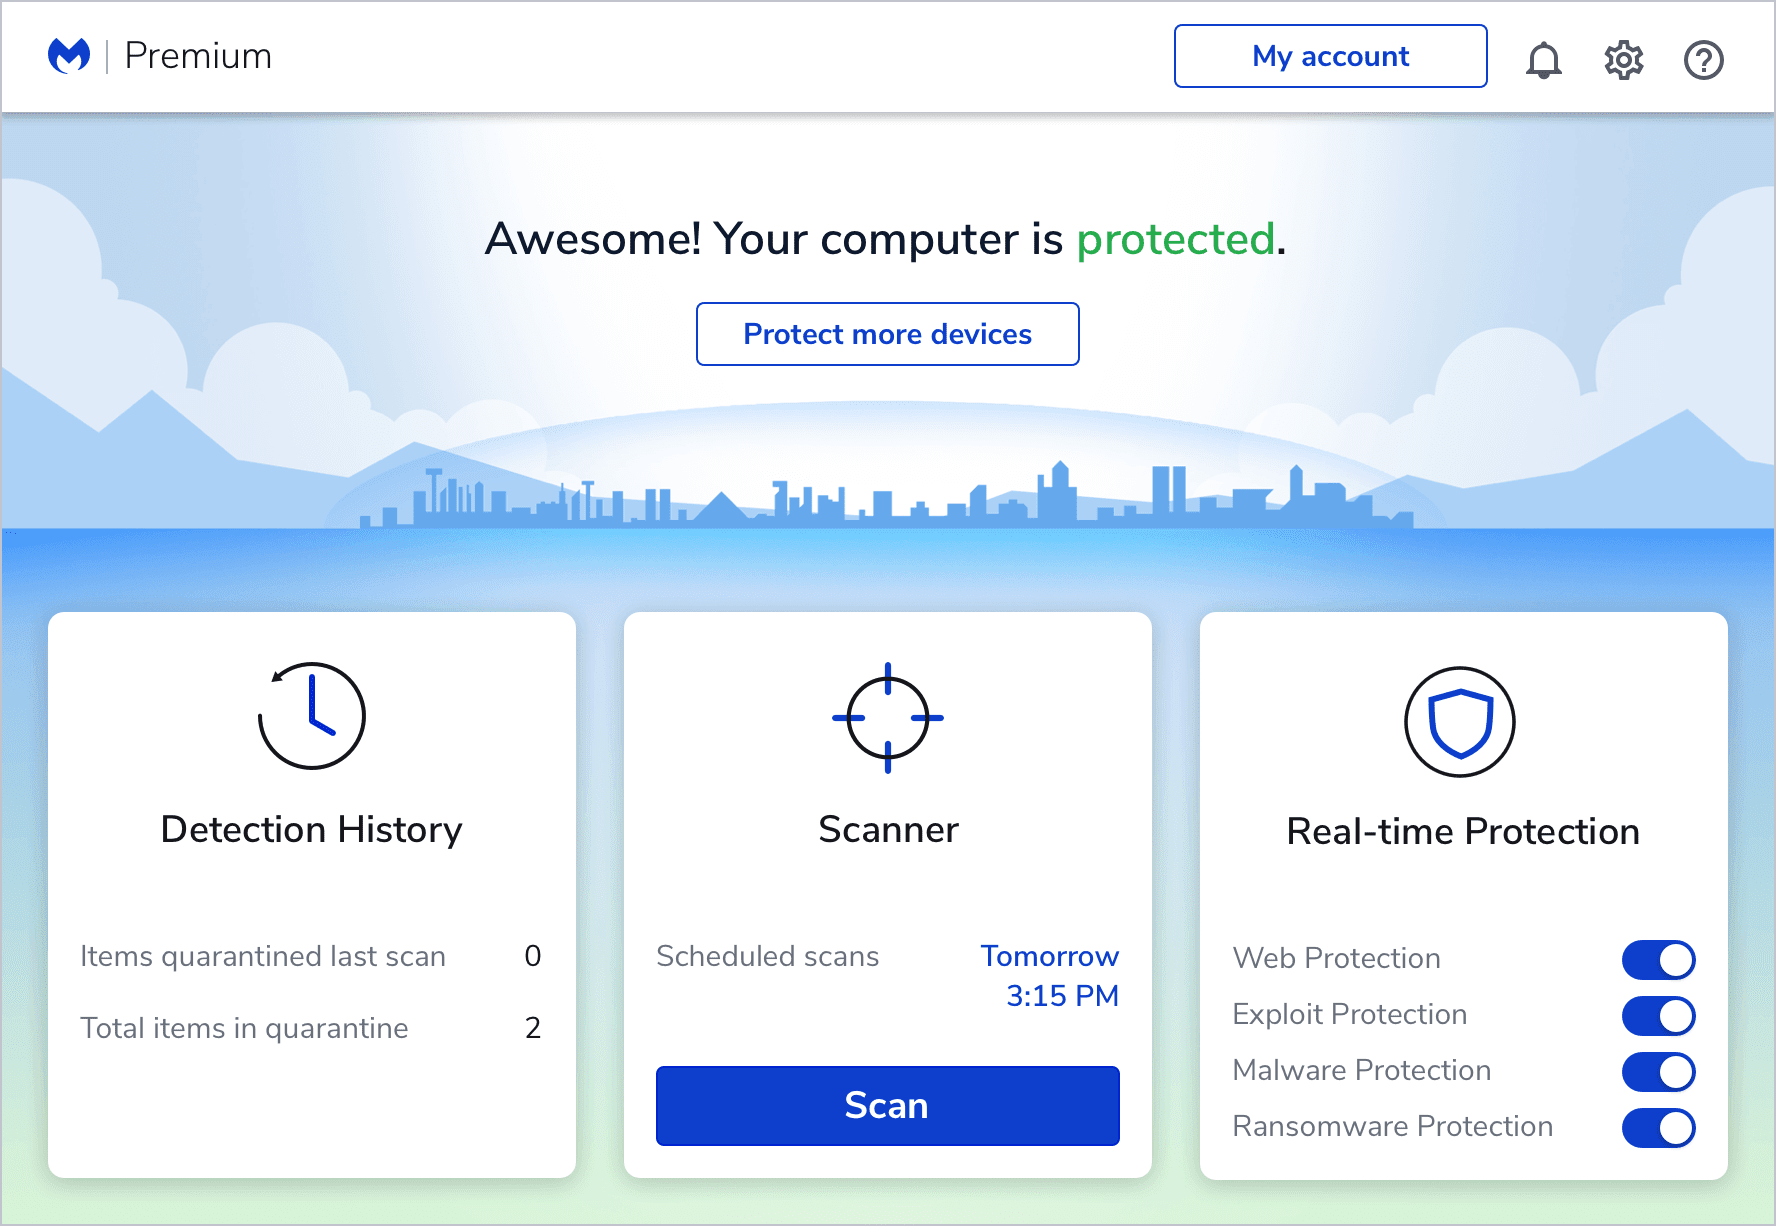 Malwarebytes Premium Dashboard Screenshot